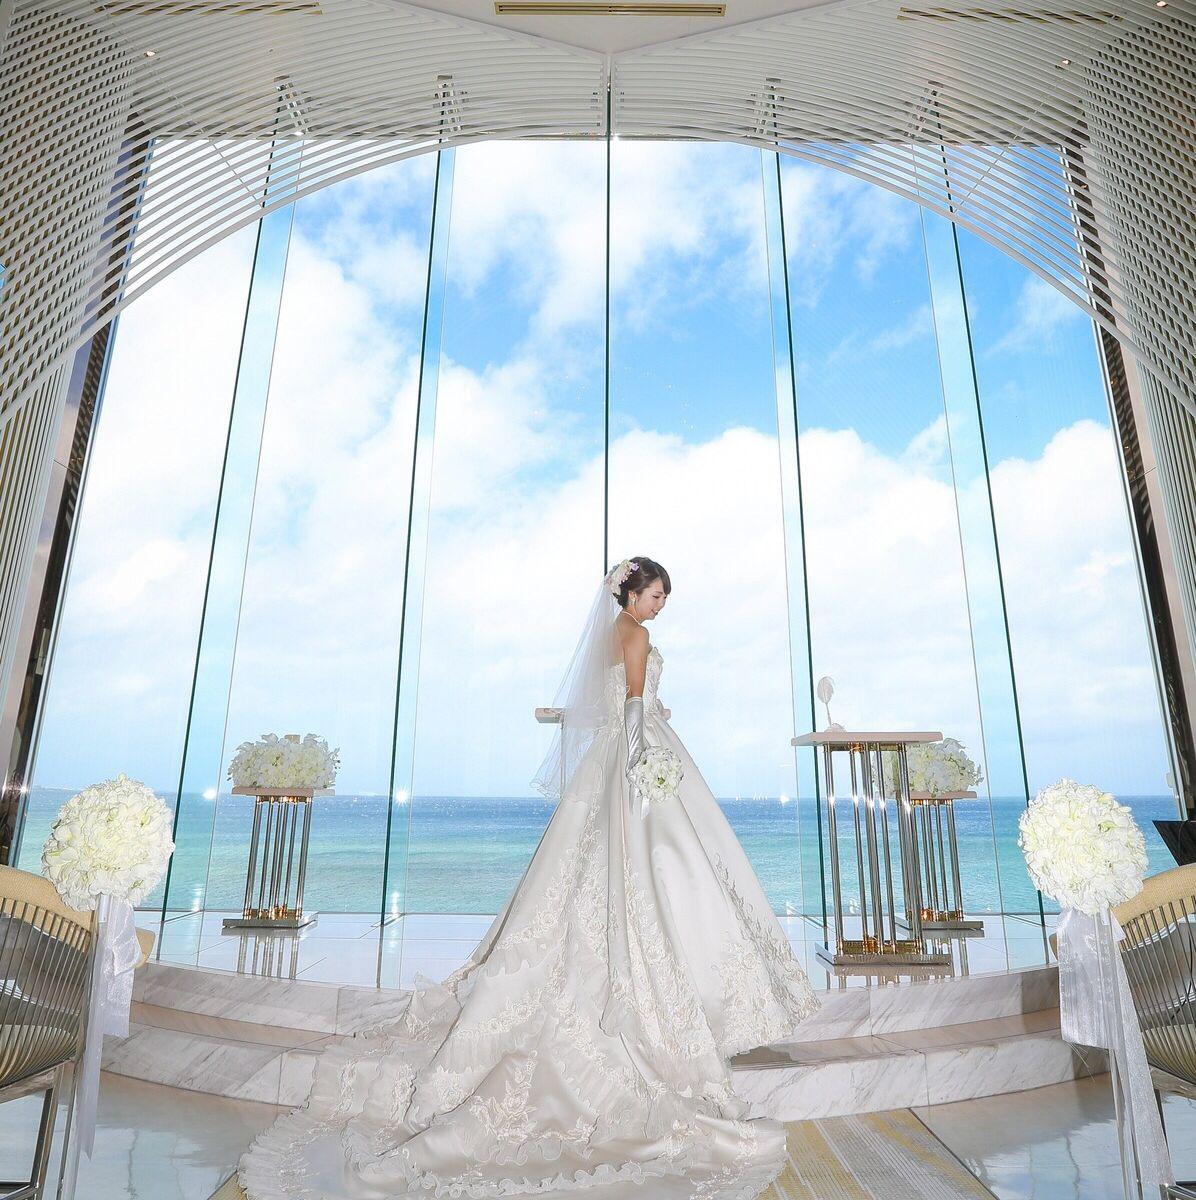 kyon_27xさんのヴォヤージュ ドゥ ルミエール Chatan Resort写真1枚目